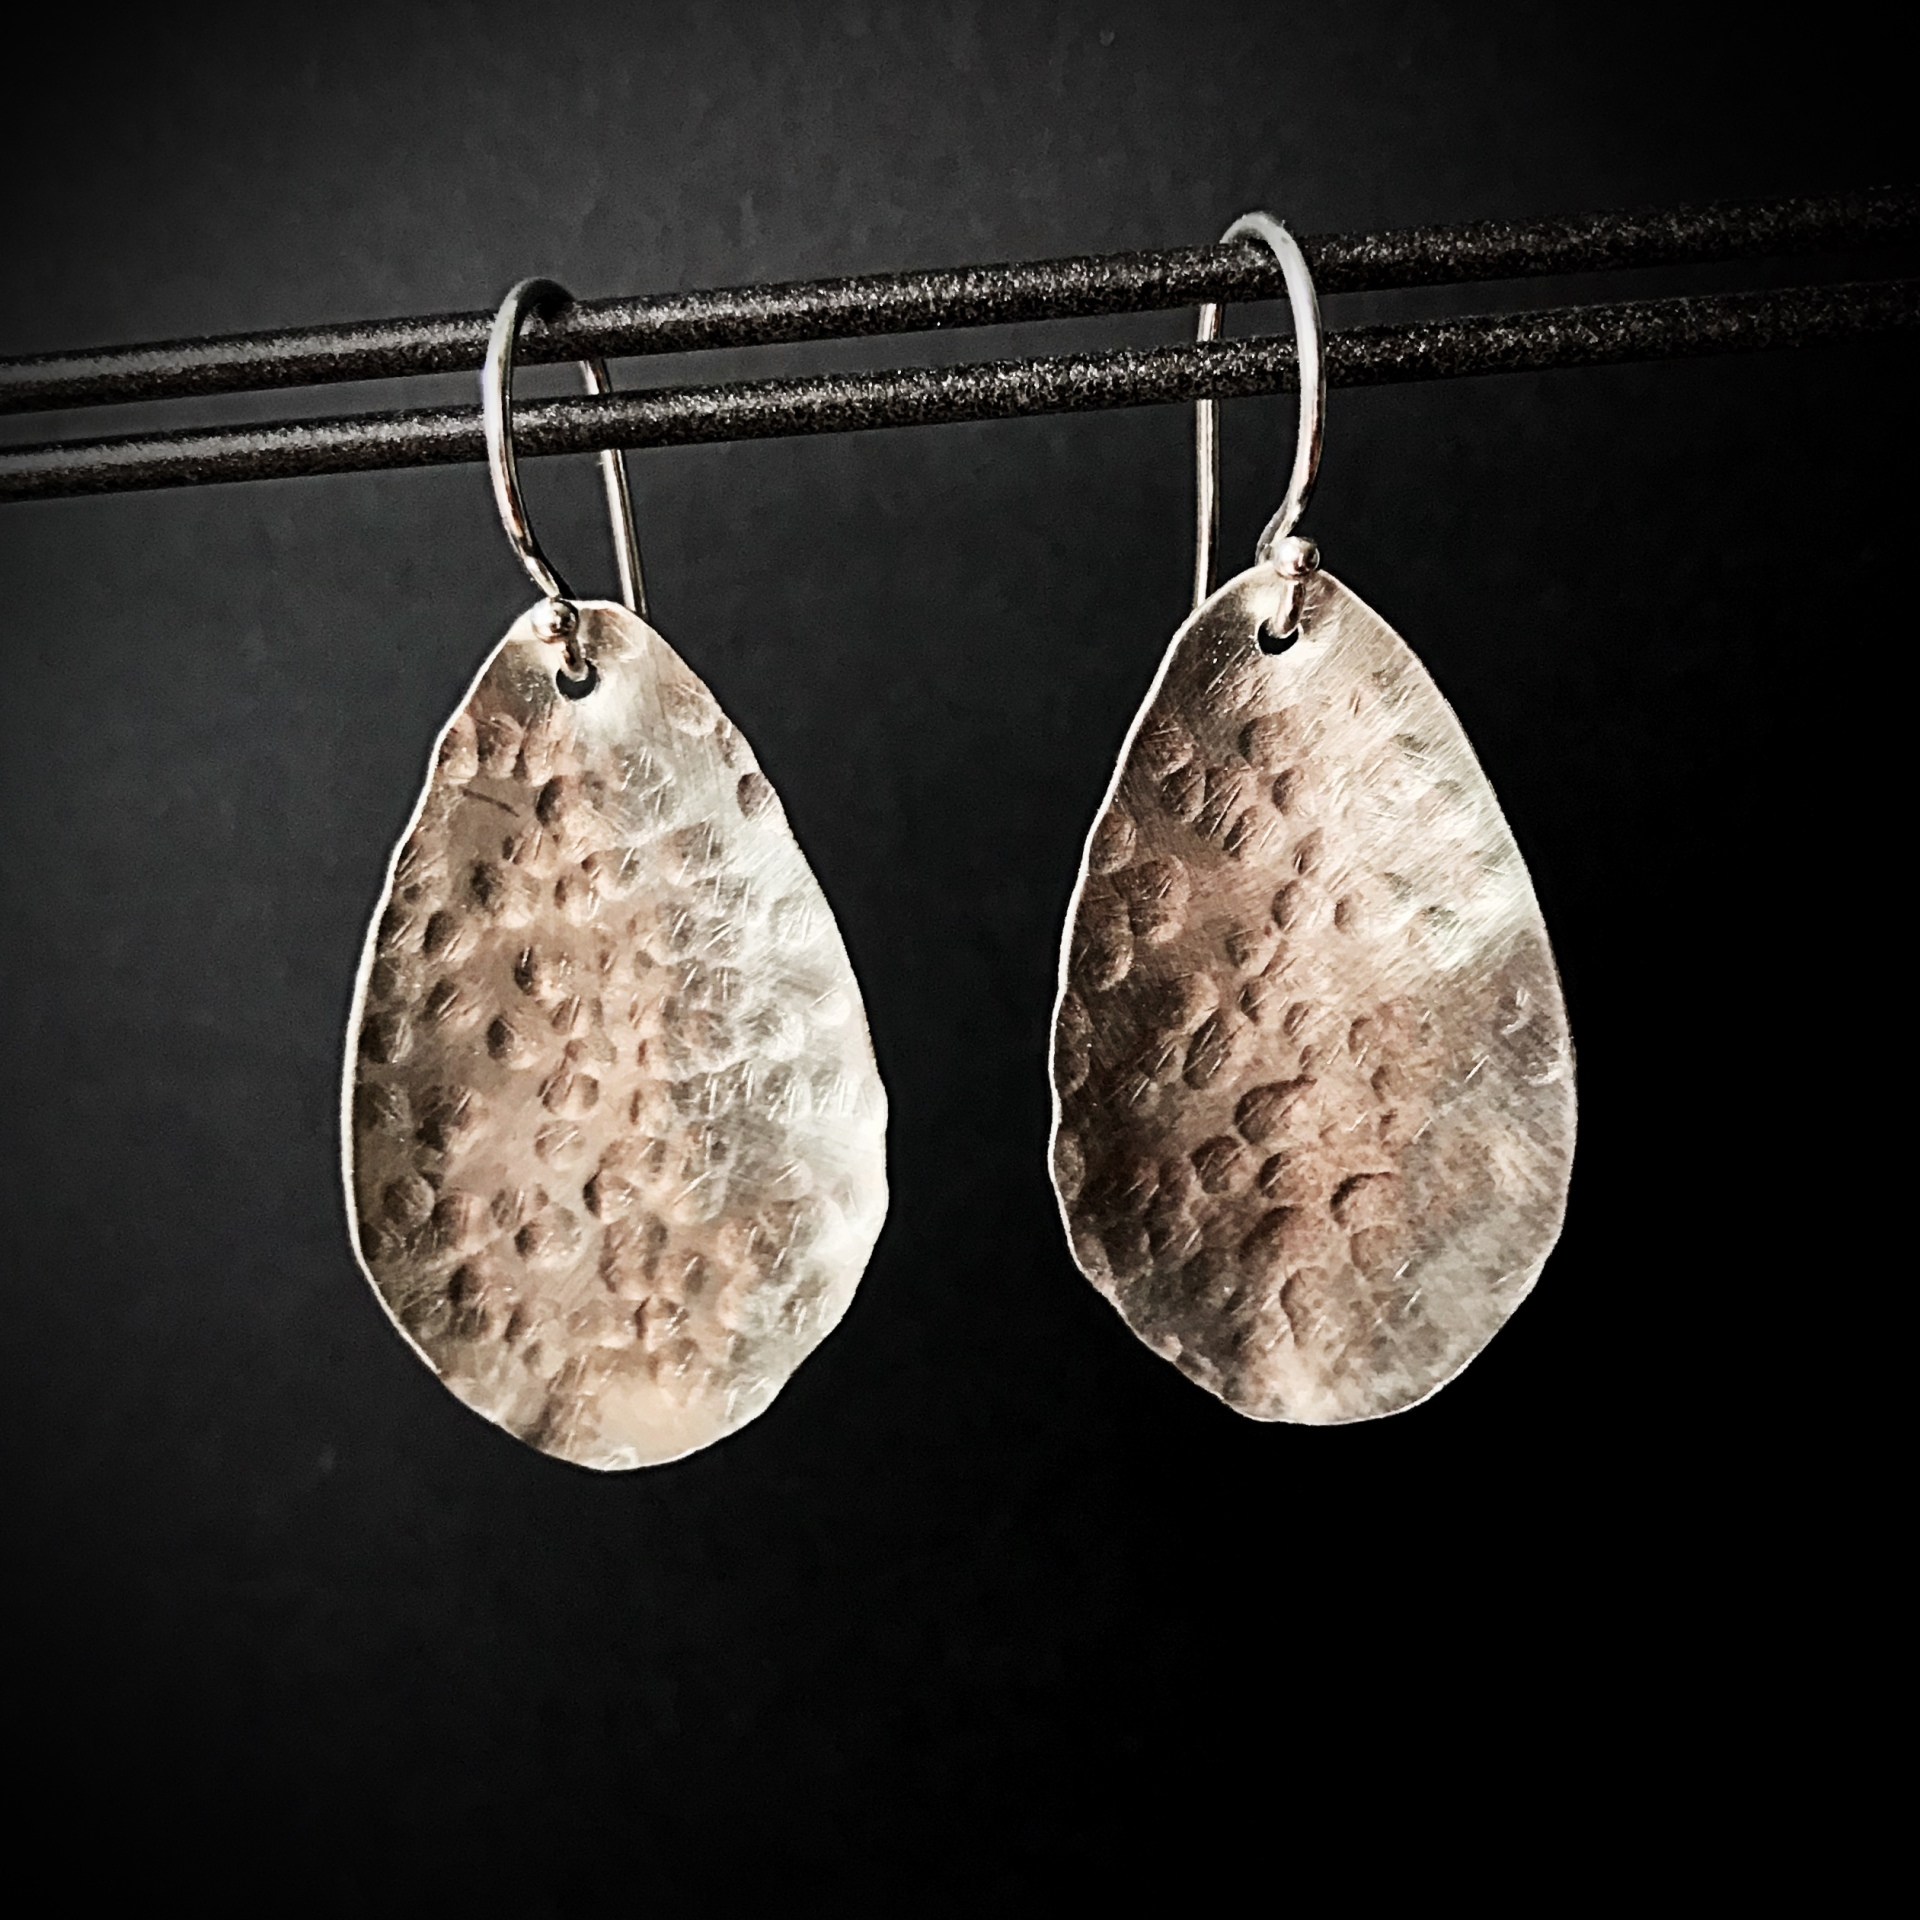 Kristin Musser - Jewelry